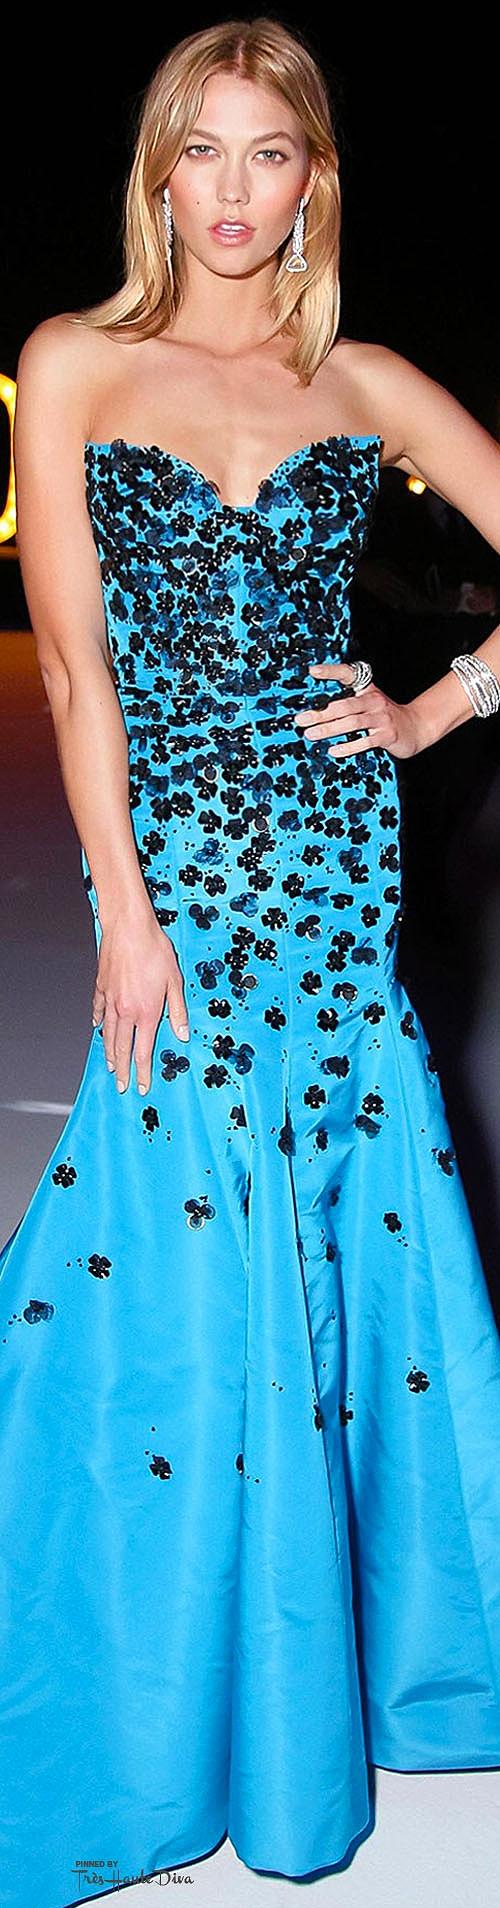 Karlie Kloss in Oscar de la Renta  Photo by Rex Features